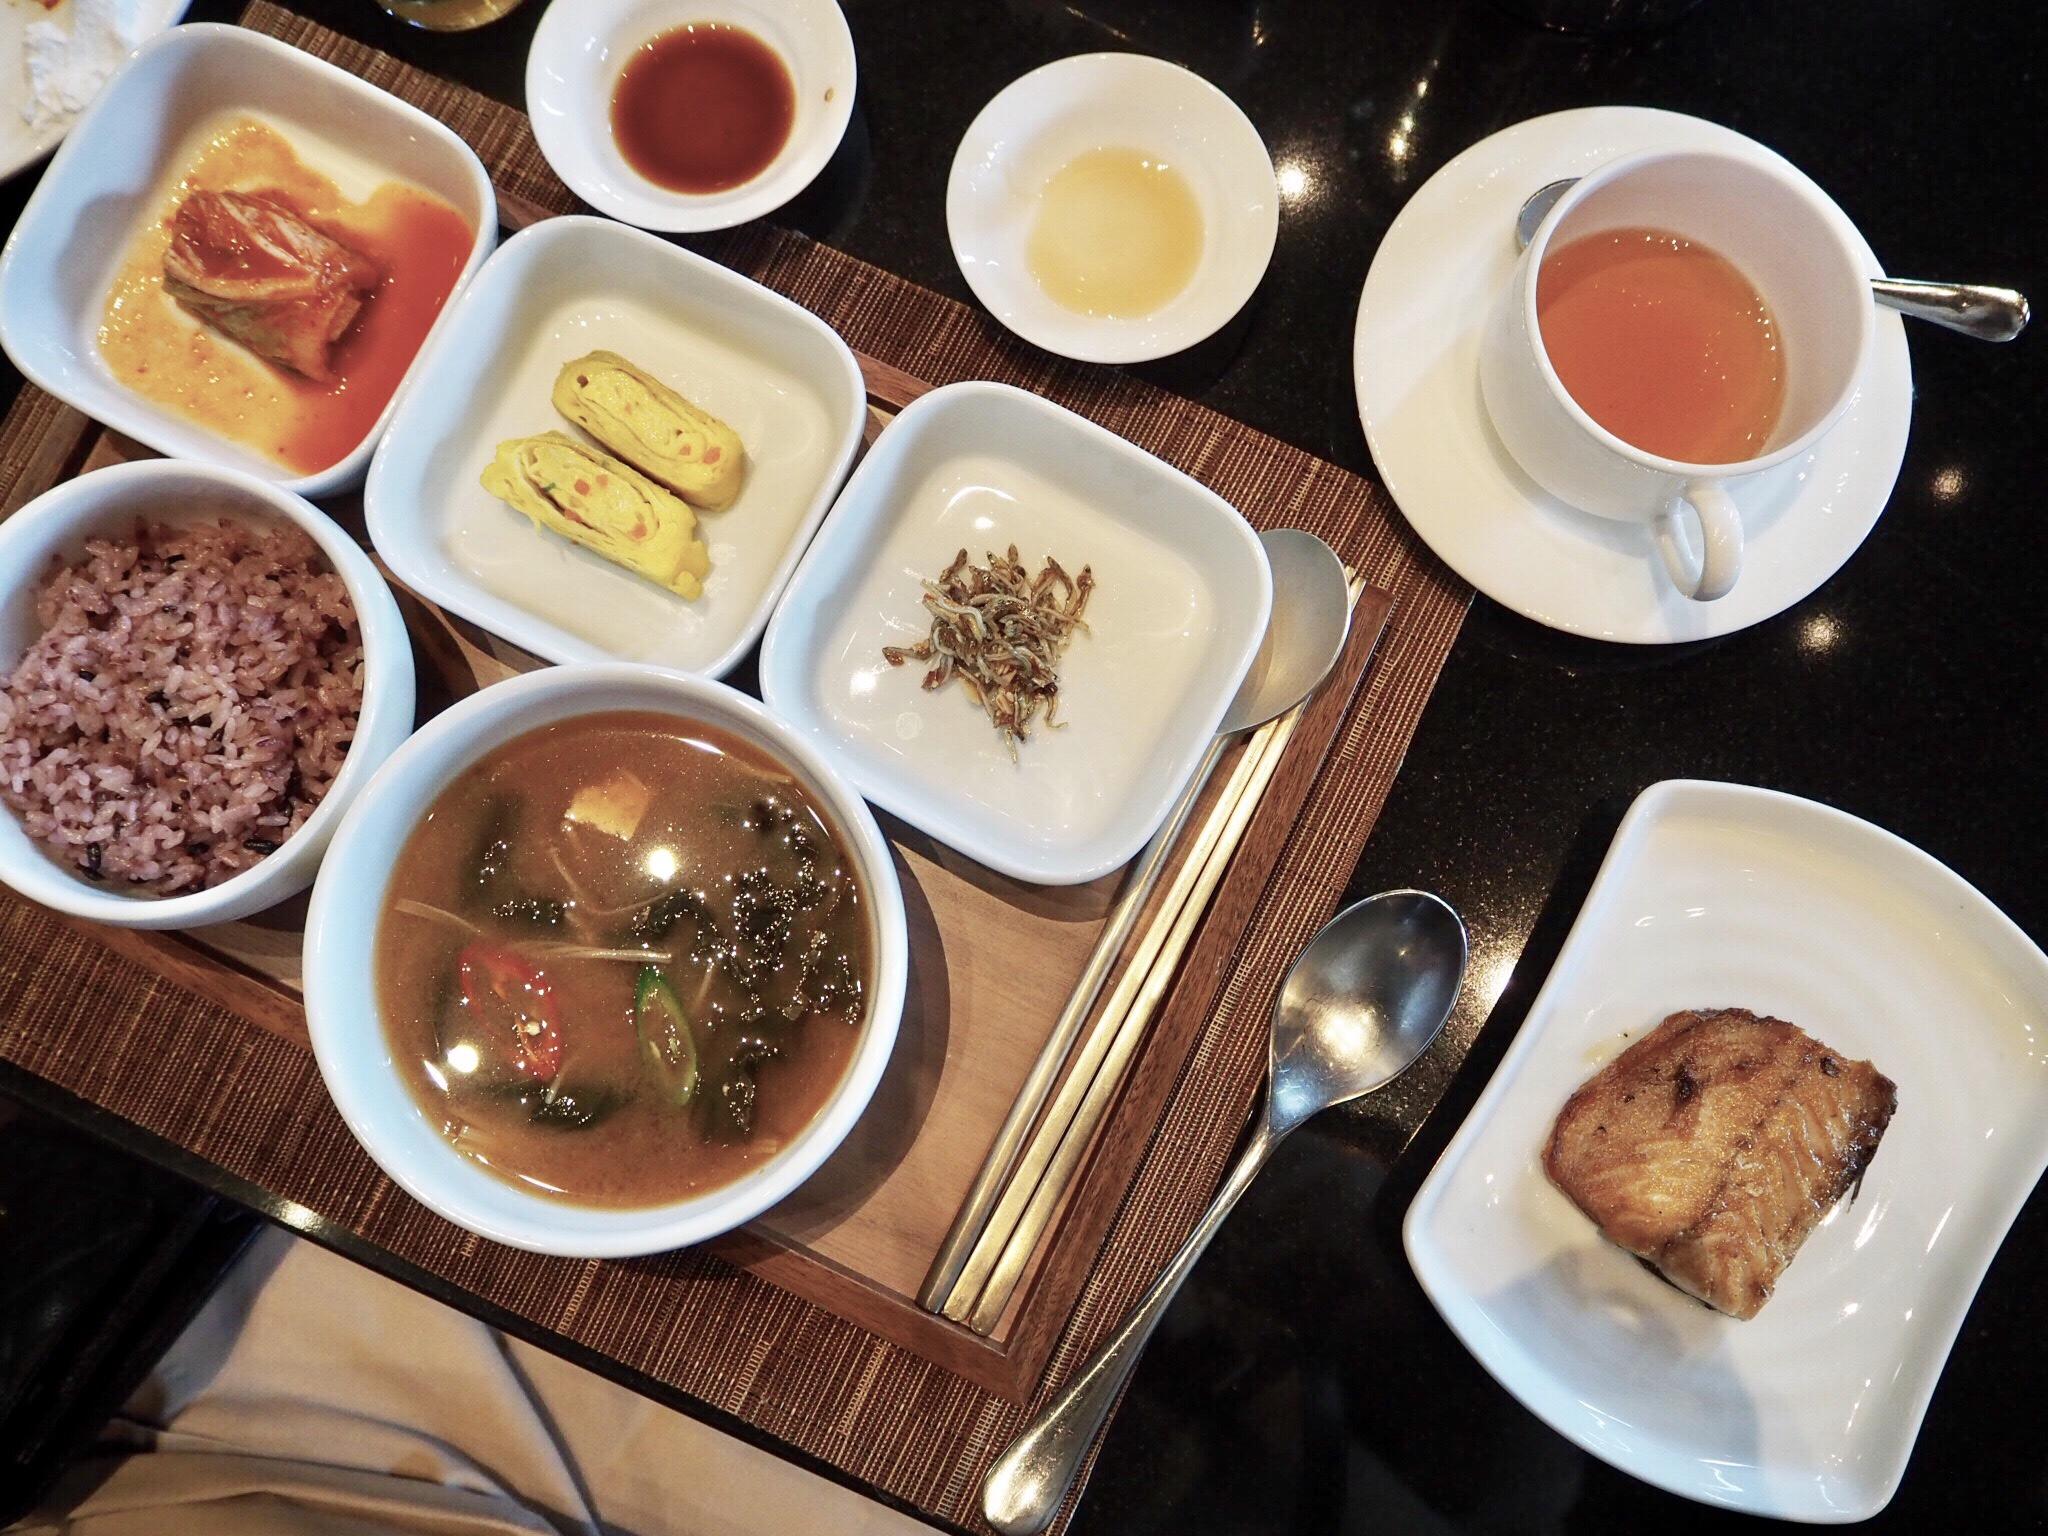 img 8045 - Banyan Tree Club & Spa Seoul - リピーターにお勧めしたい韓国ソウルのちょっと贅沢なステイ先